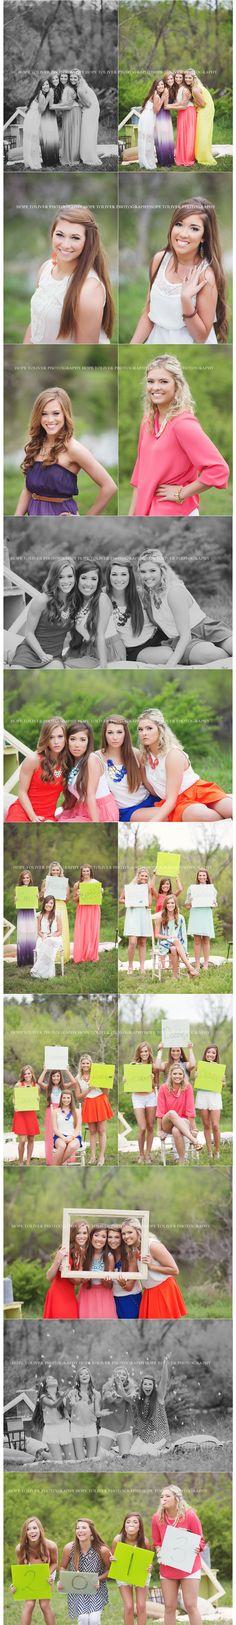 Hope Toliver Photography, Tulsa, Ok Senior Photographer bestfriends sessions